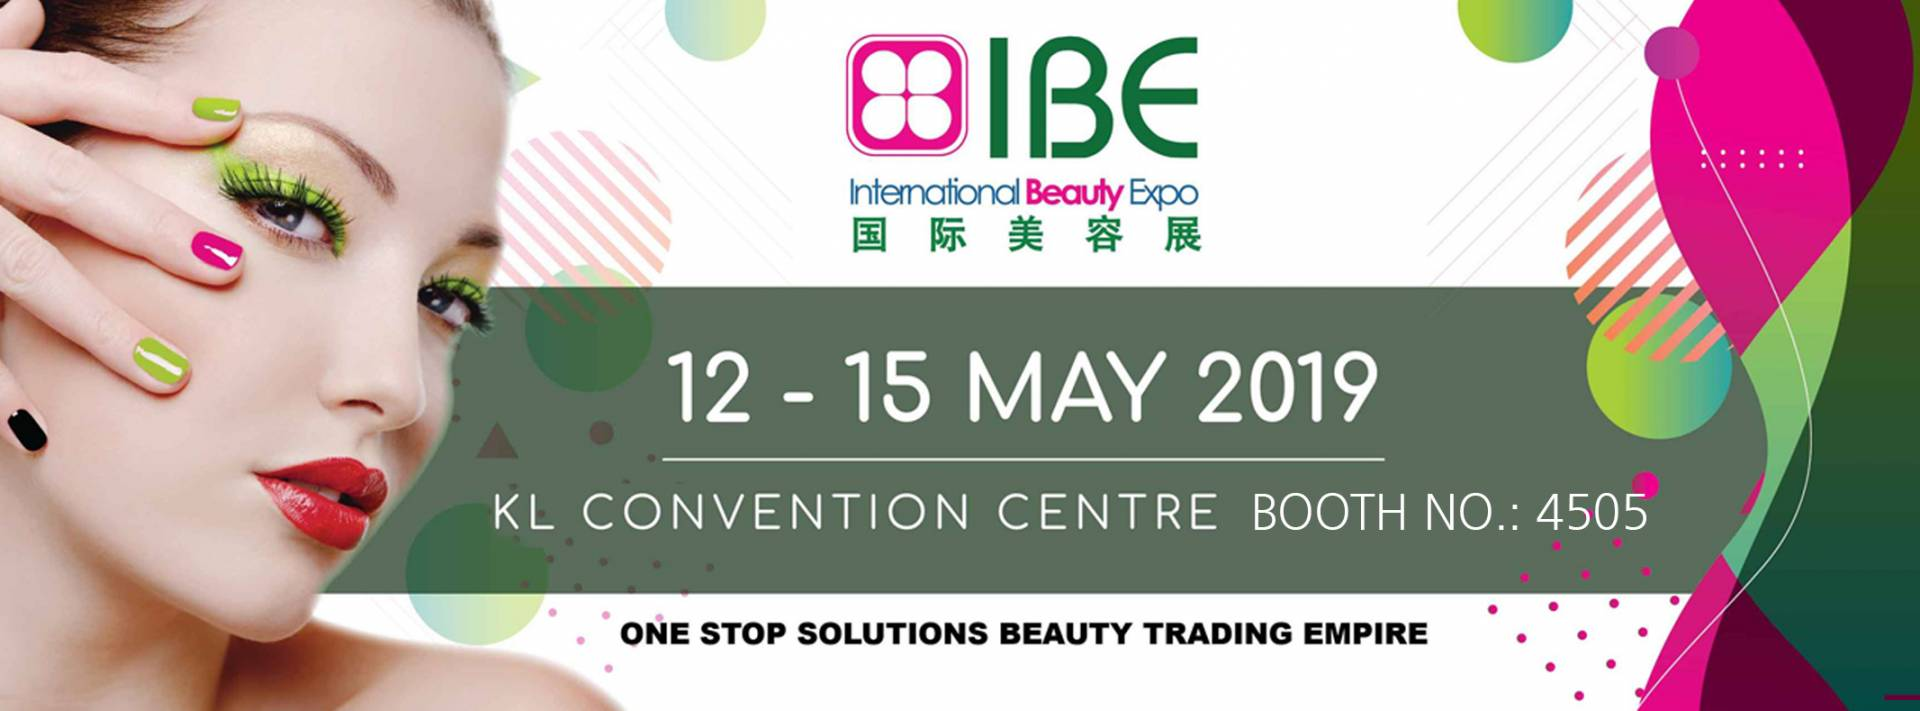 International Beauty Expo Malaysia 2019   BIOCROWN News and